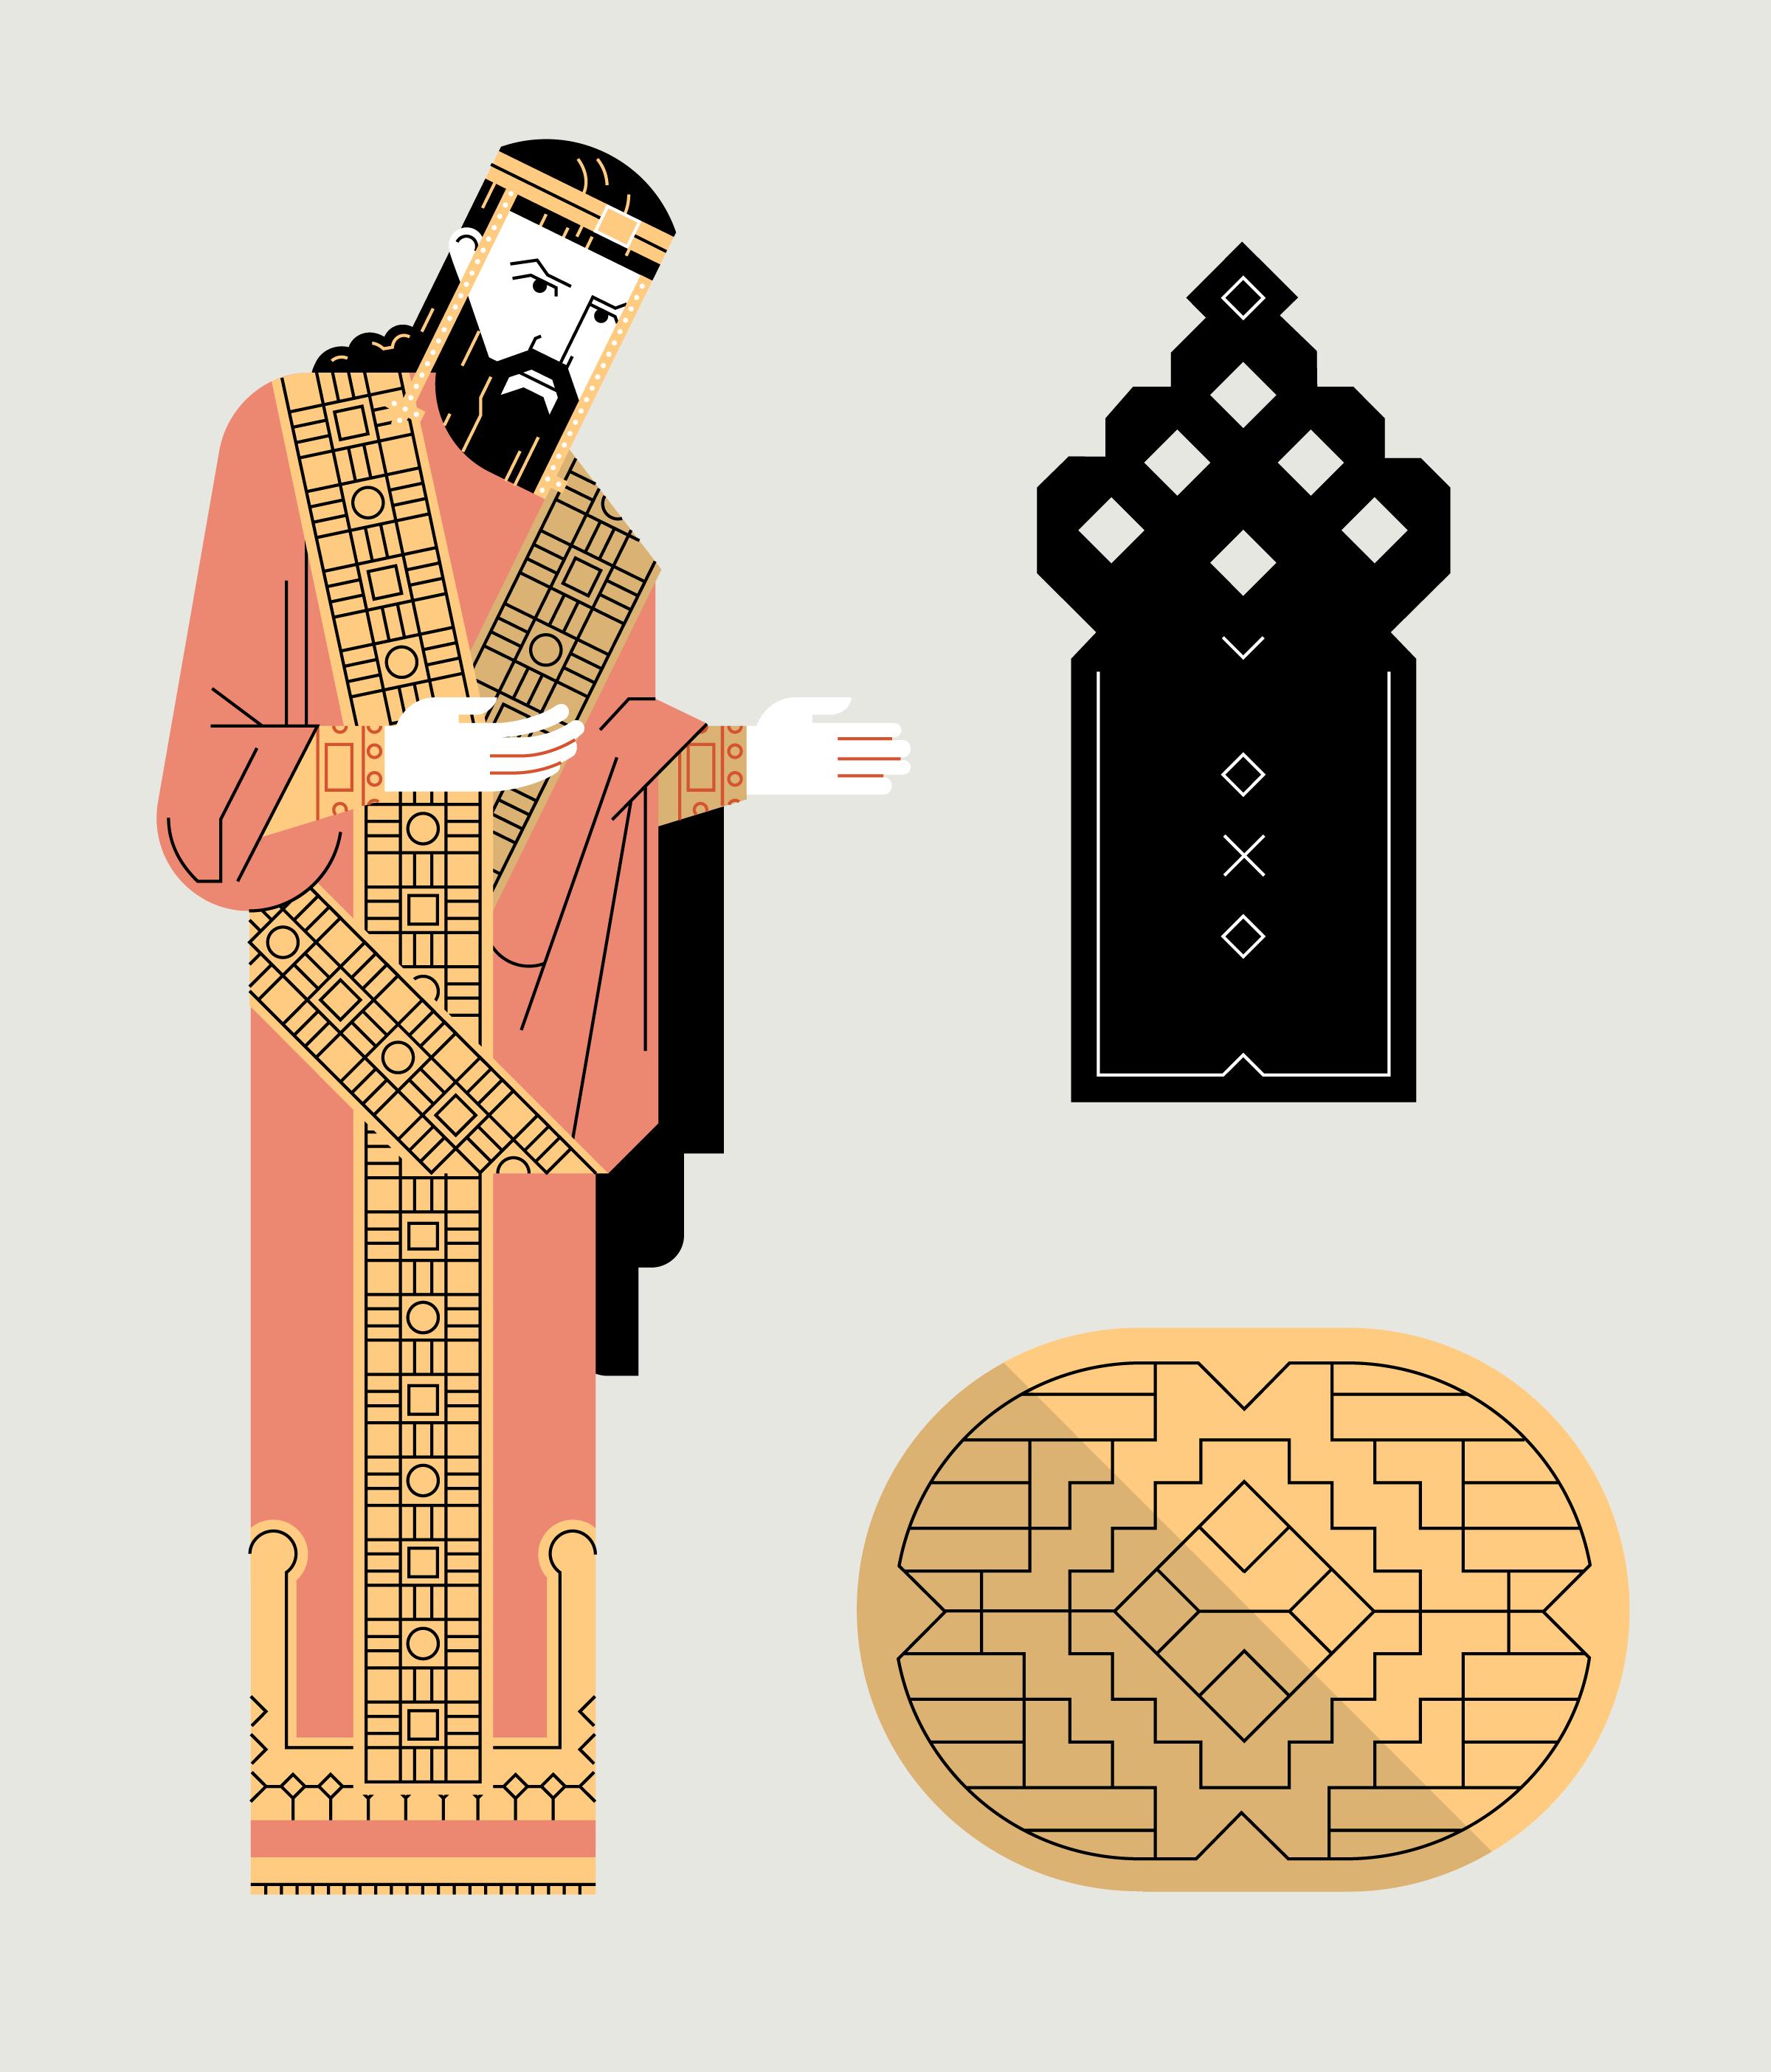 aleksandar-savic_cps_infographic-slavic-migrations3